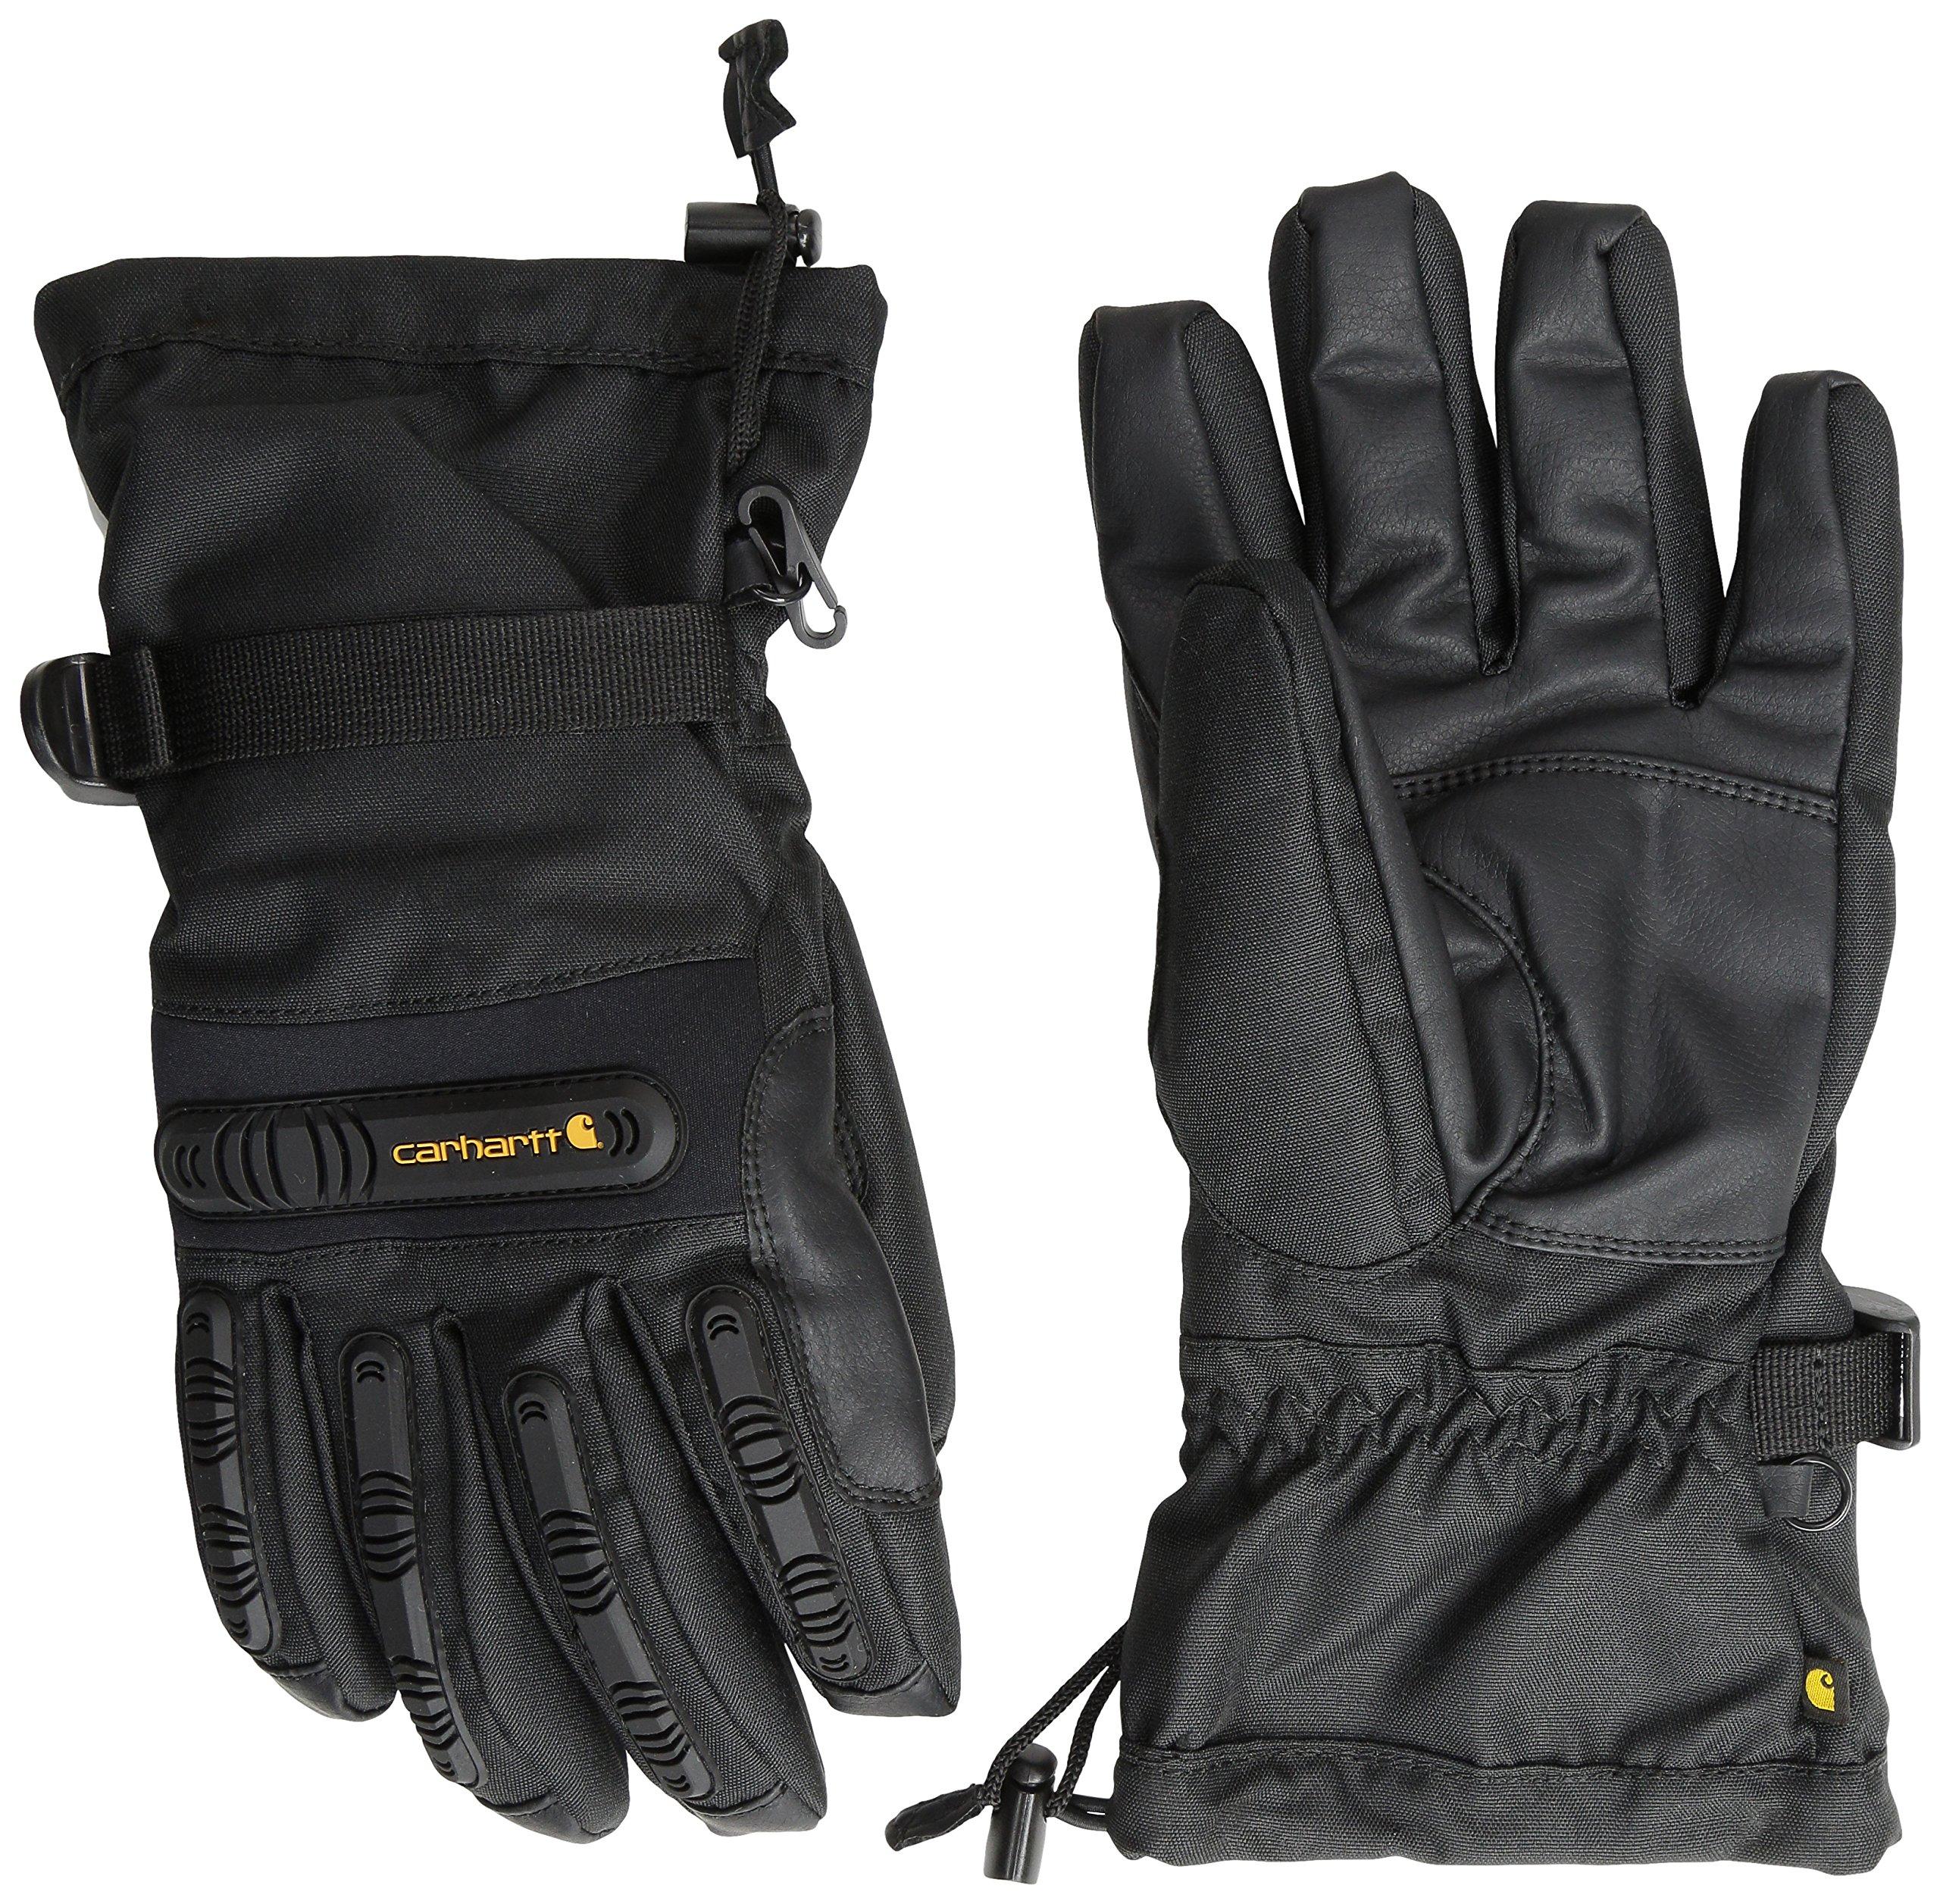 Carhartt Men's Impact Gauntlet Glove, Black, Medium